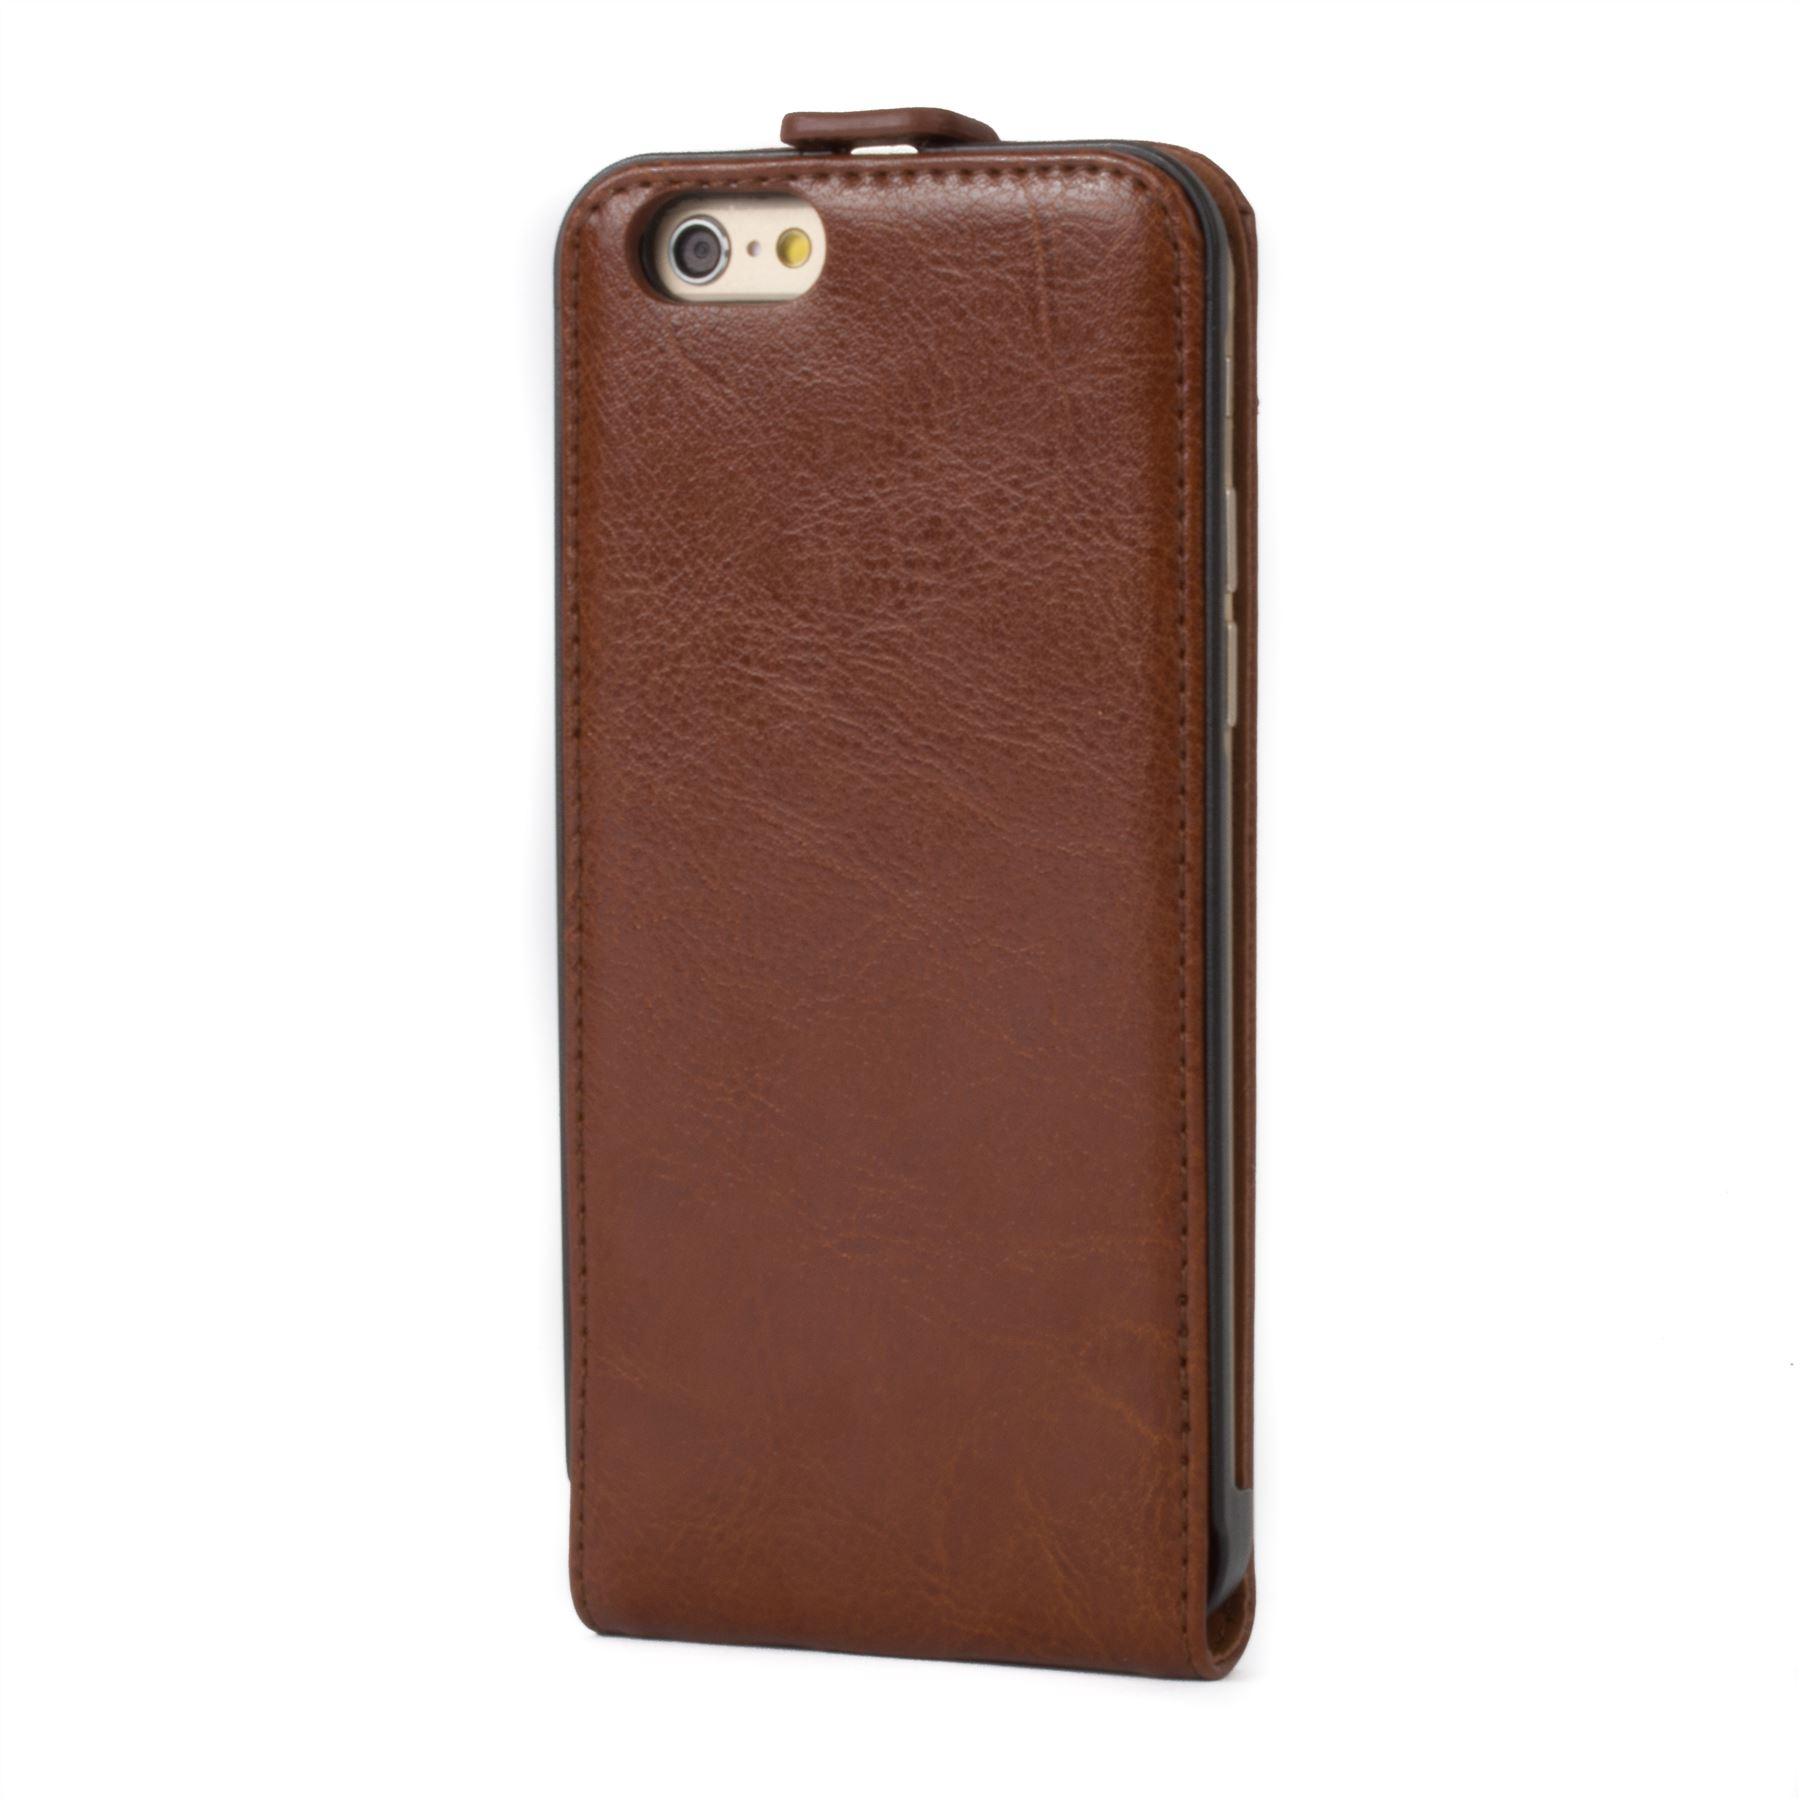 snakehive apple iphone 6 6s premium leather flip case. Black Bedroom Furniture Sets. Home Design Ideas